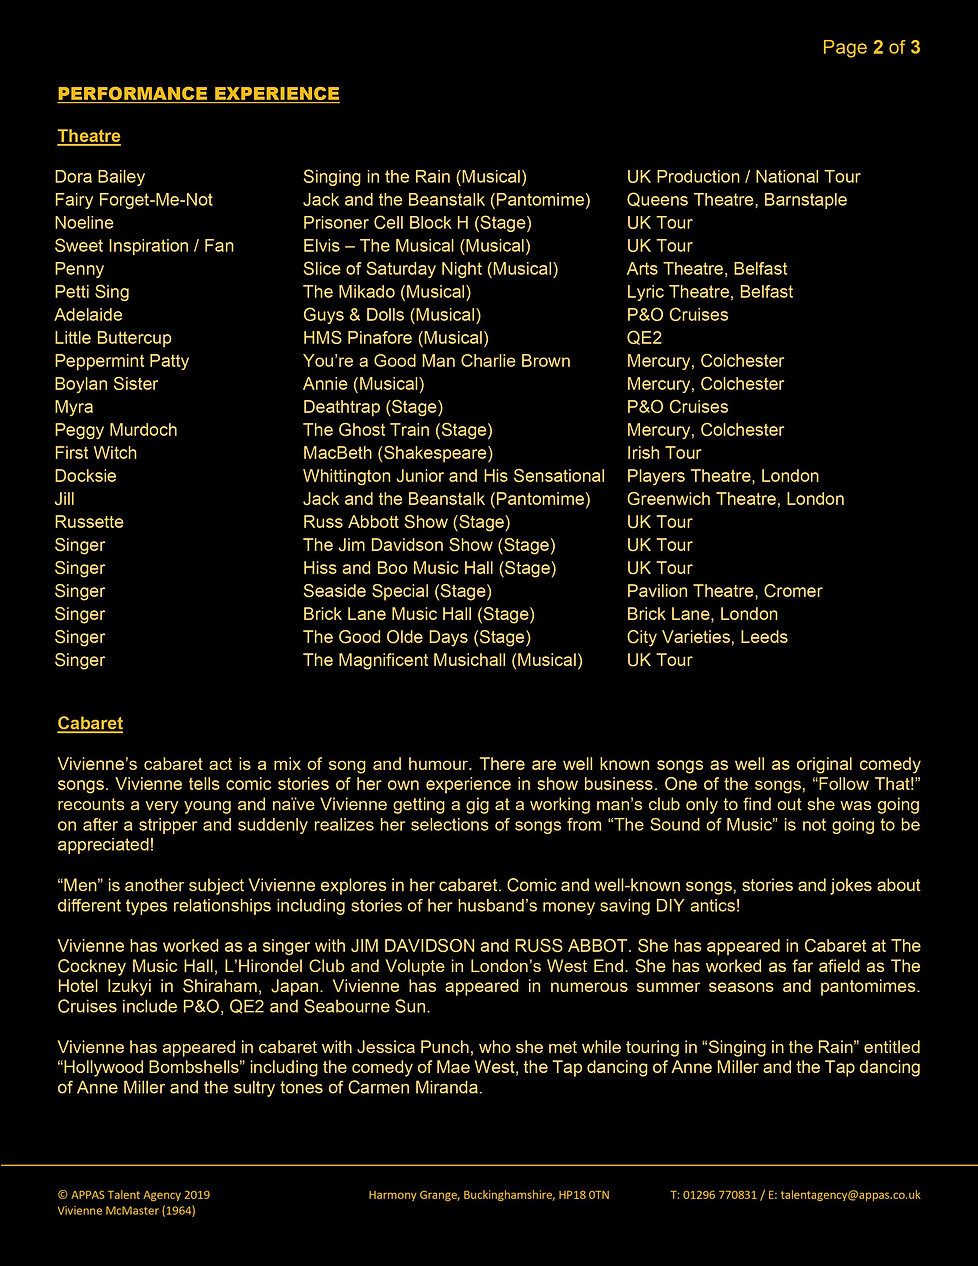 VIVIENNE McMASTER WEB CV (APR 2020) 2.jp